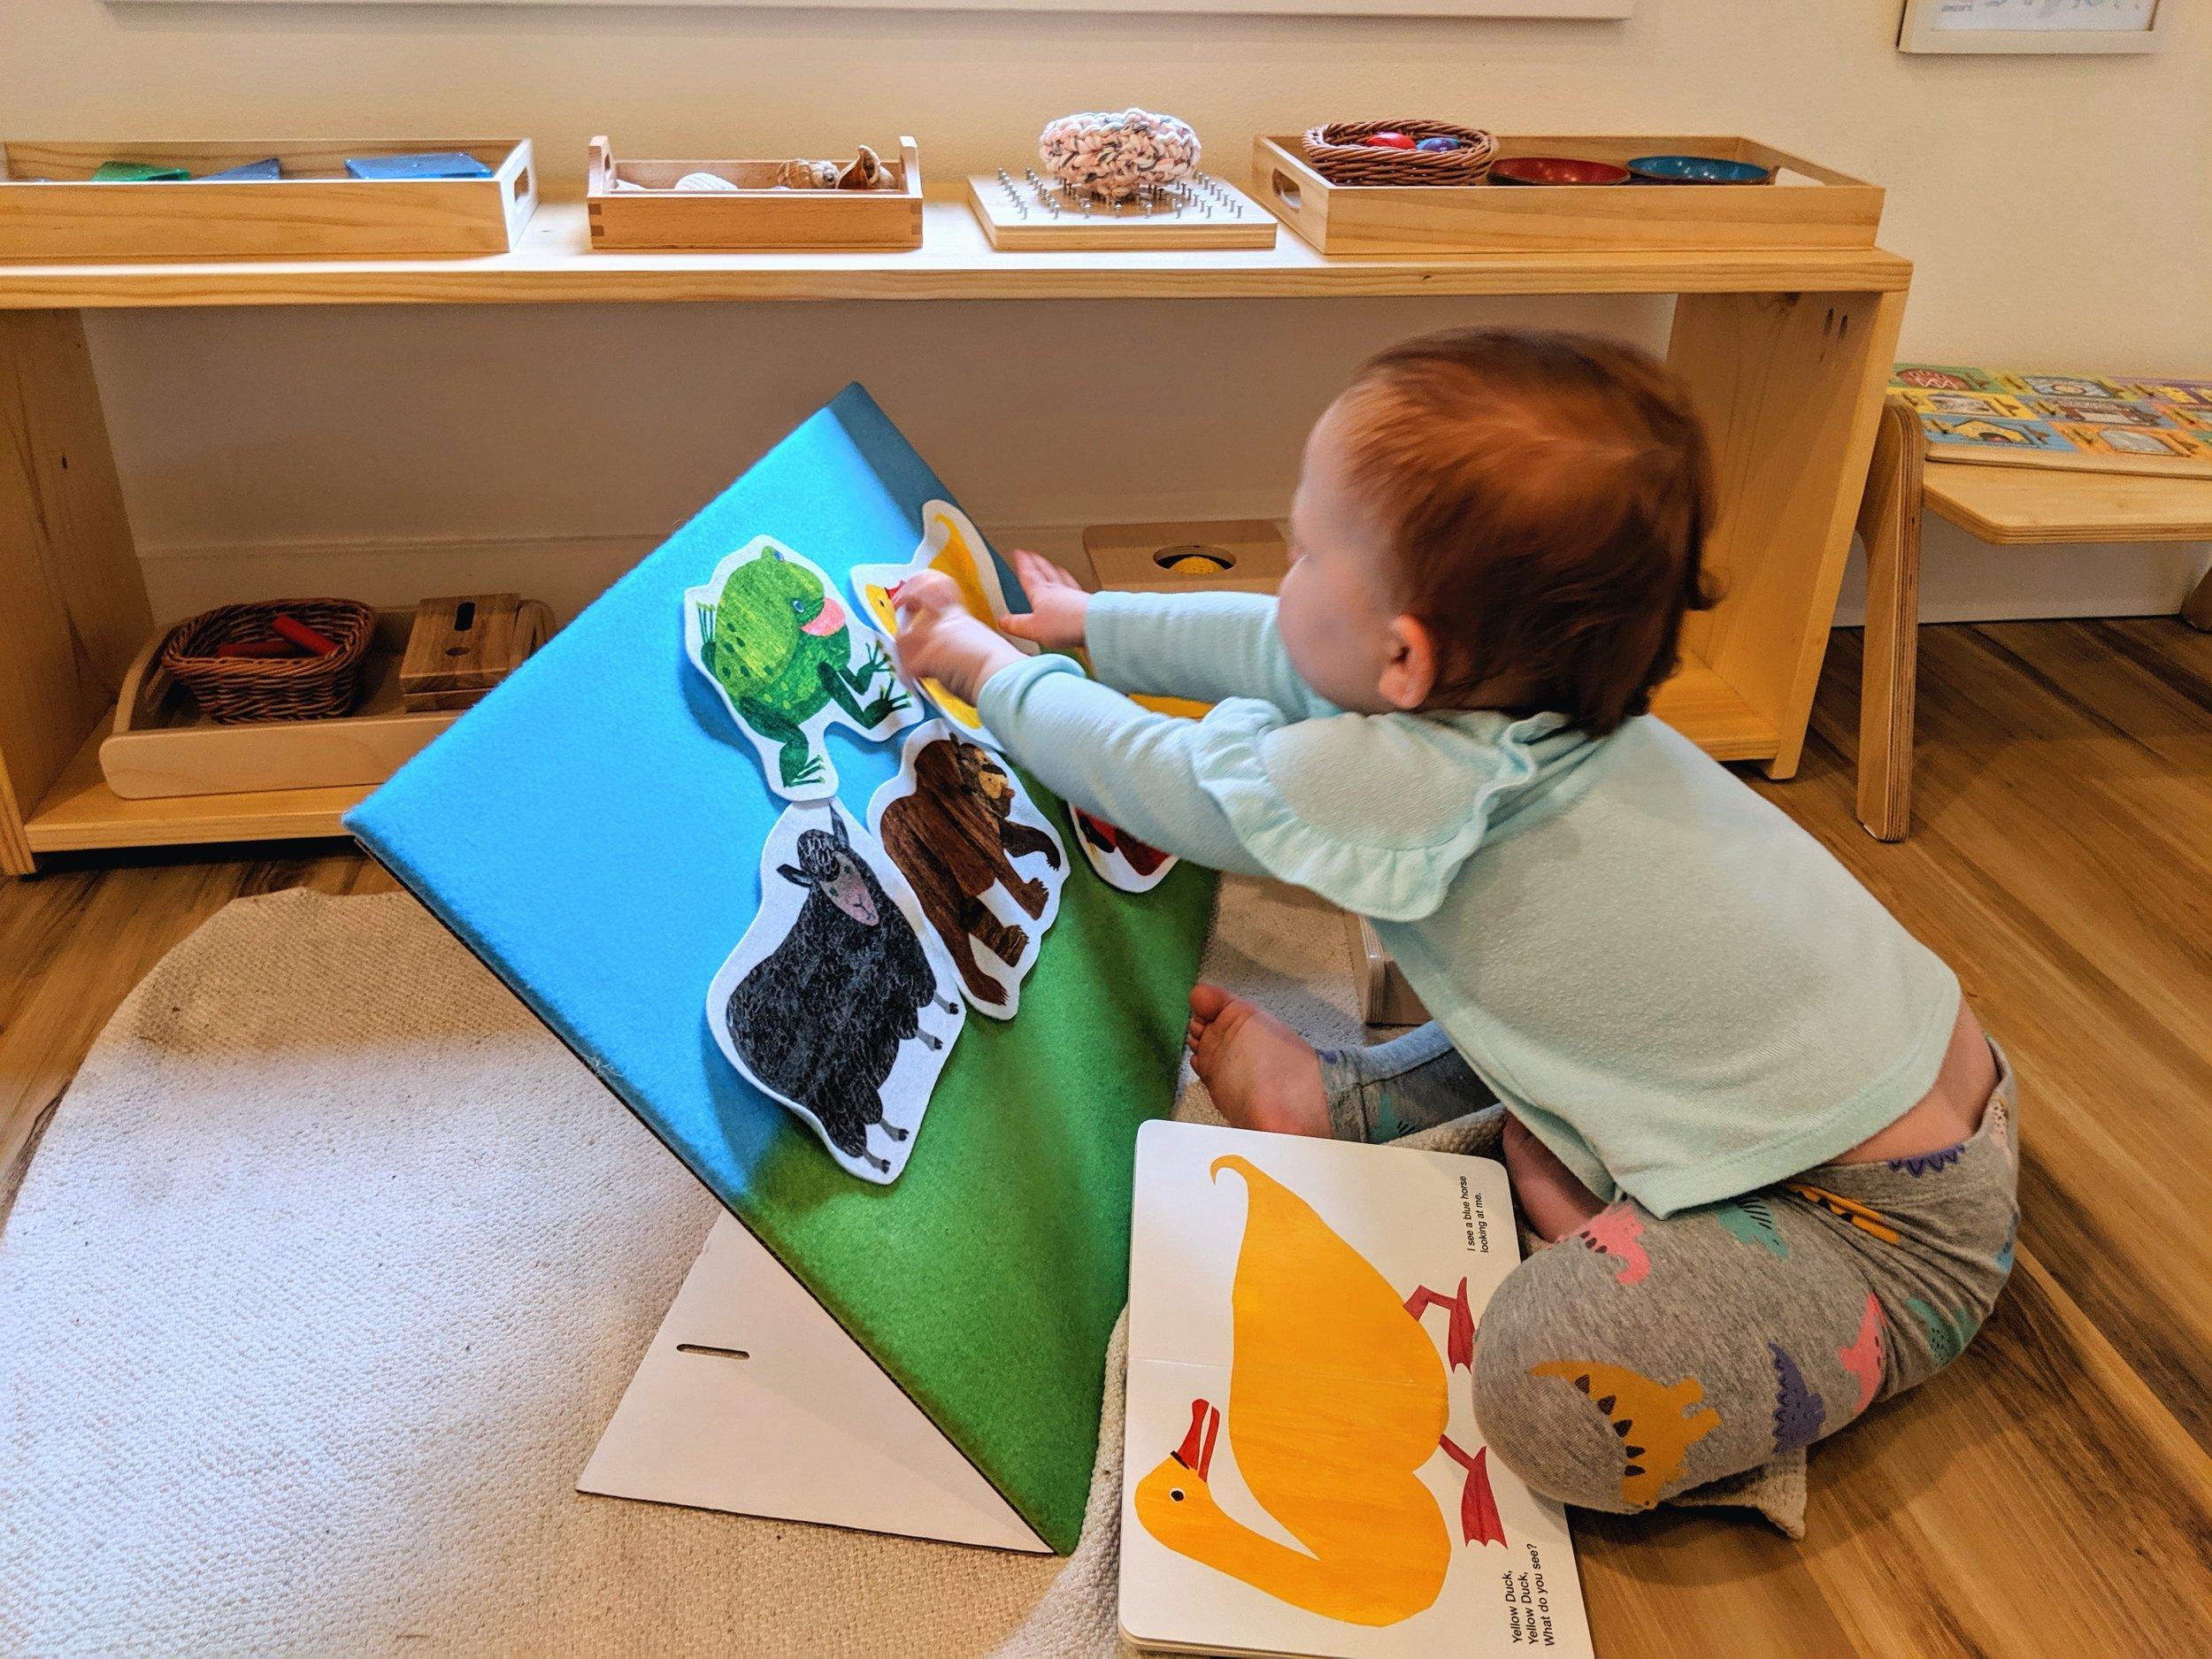 Our Montessori Shelf at 24 Months - Montessori in Real Life